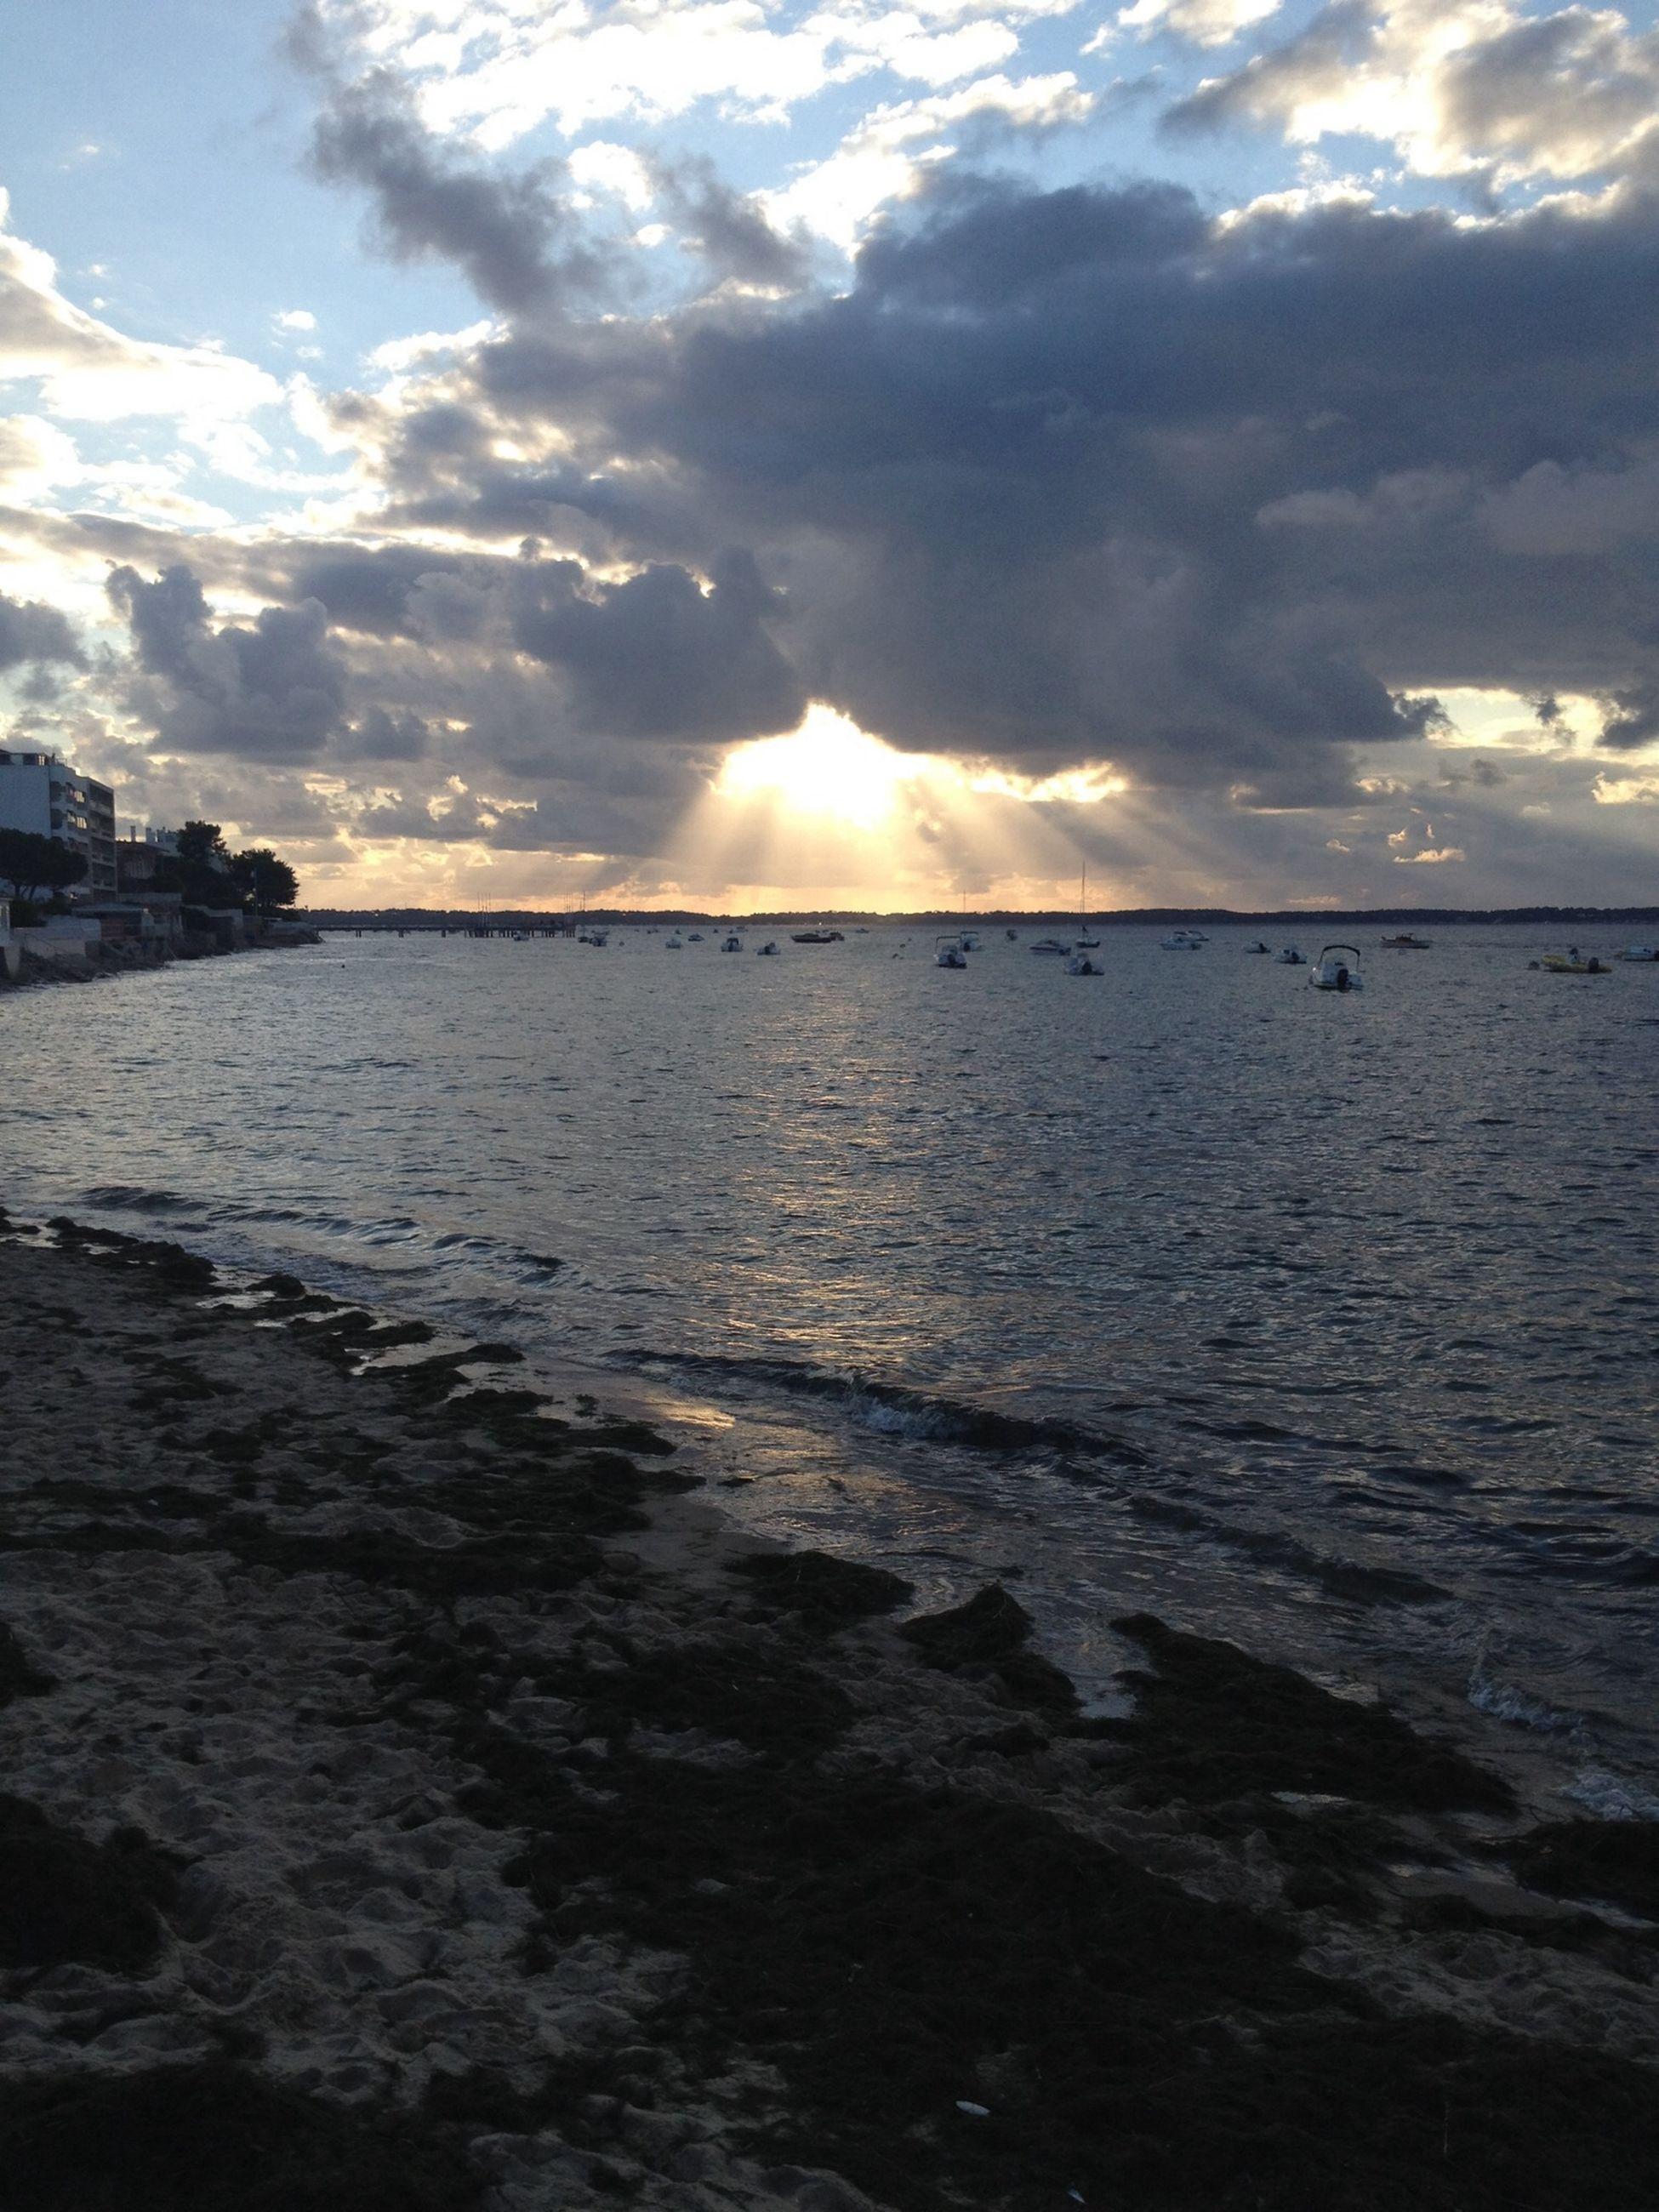 sea, water, sky, cloud - sky, scenics, sunset, tranquil scene, beauty in nature, sun, horizon over water, tranquility, cloudy, nature, beach, sunlight, cloud, sunbeam, idyllic, shore, reflection